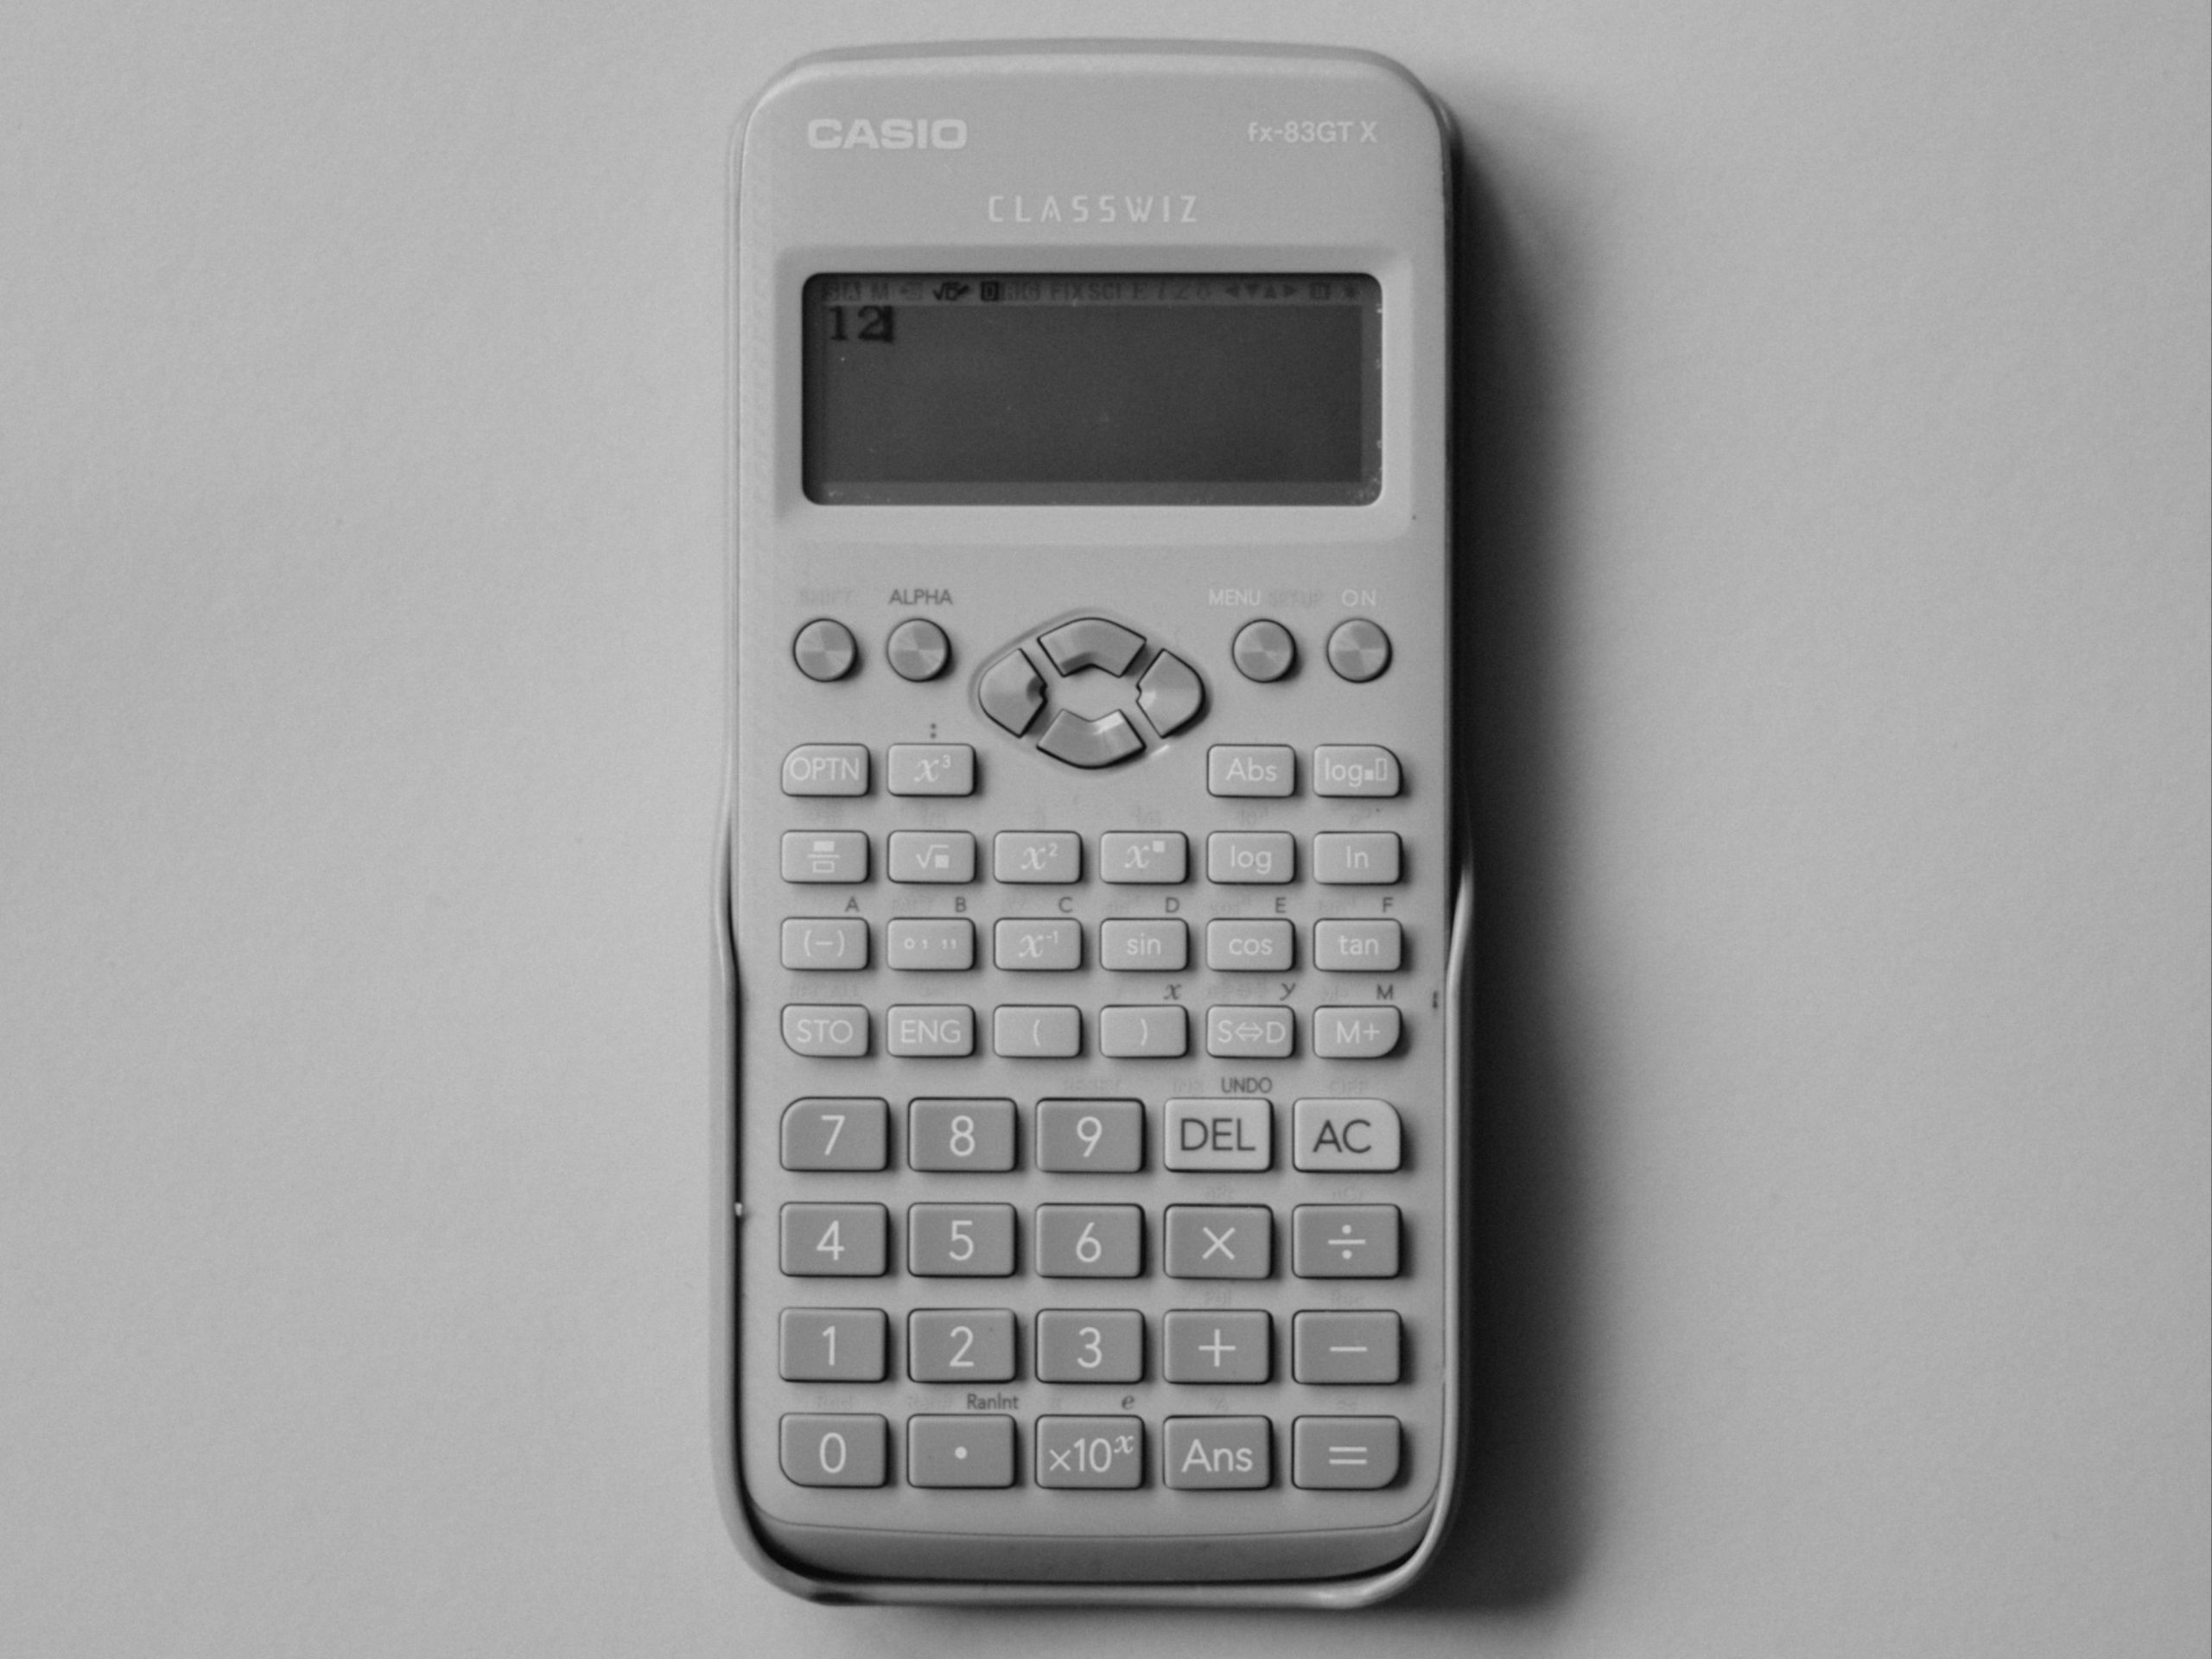 A digital calculator.